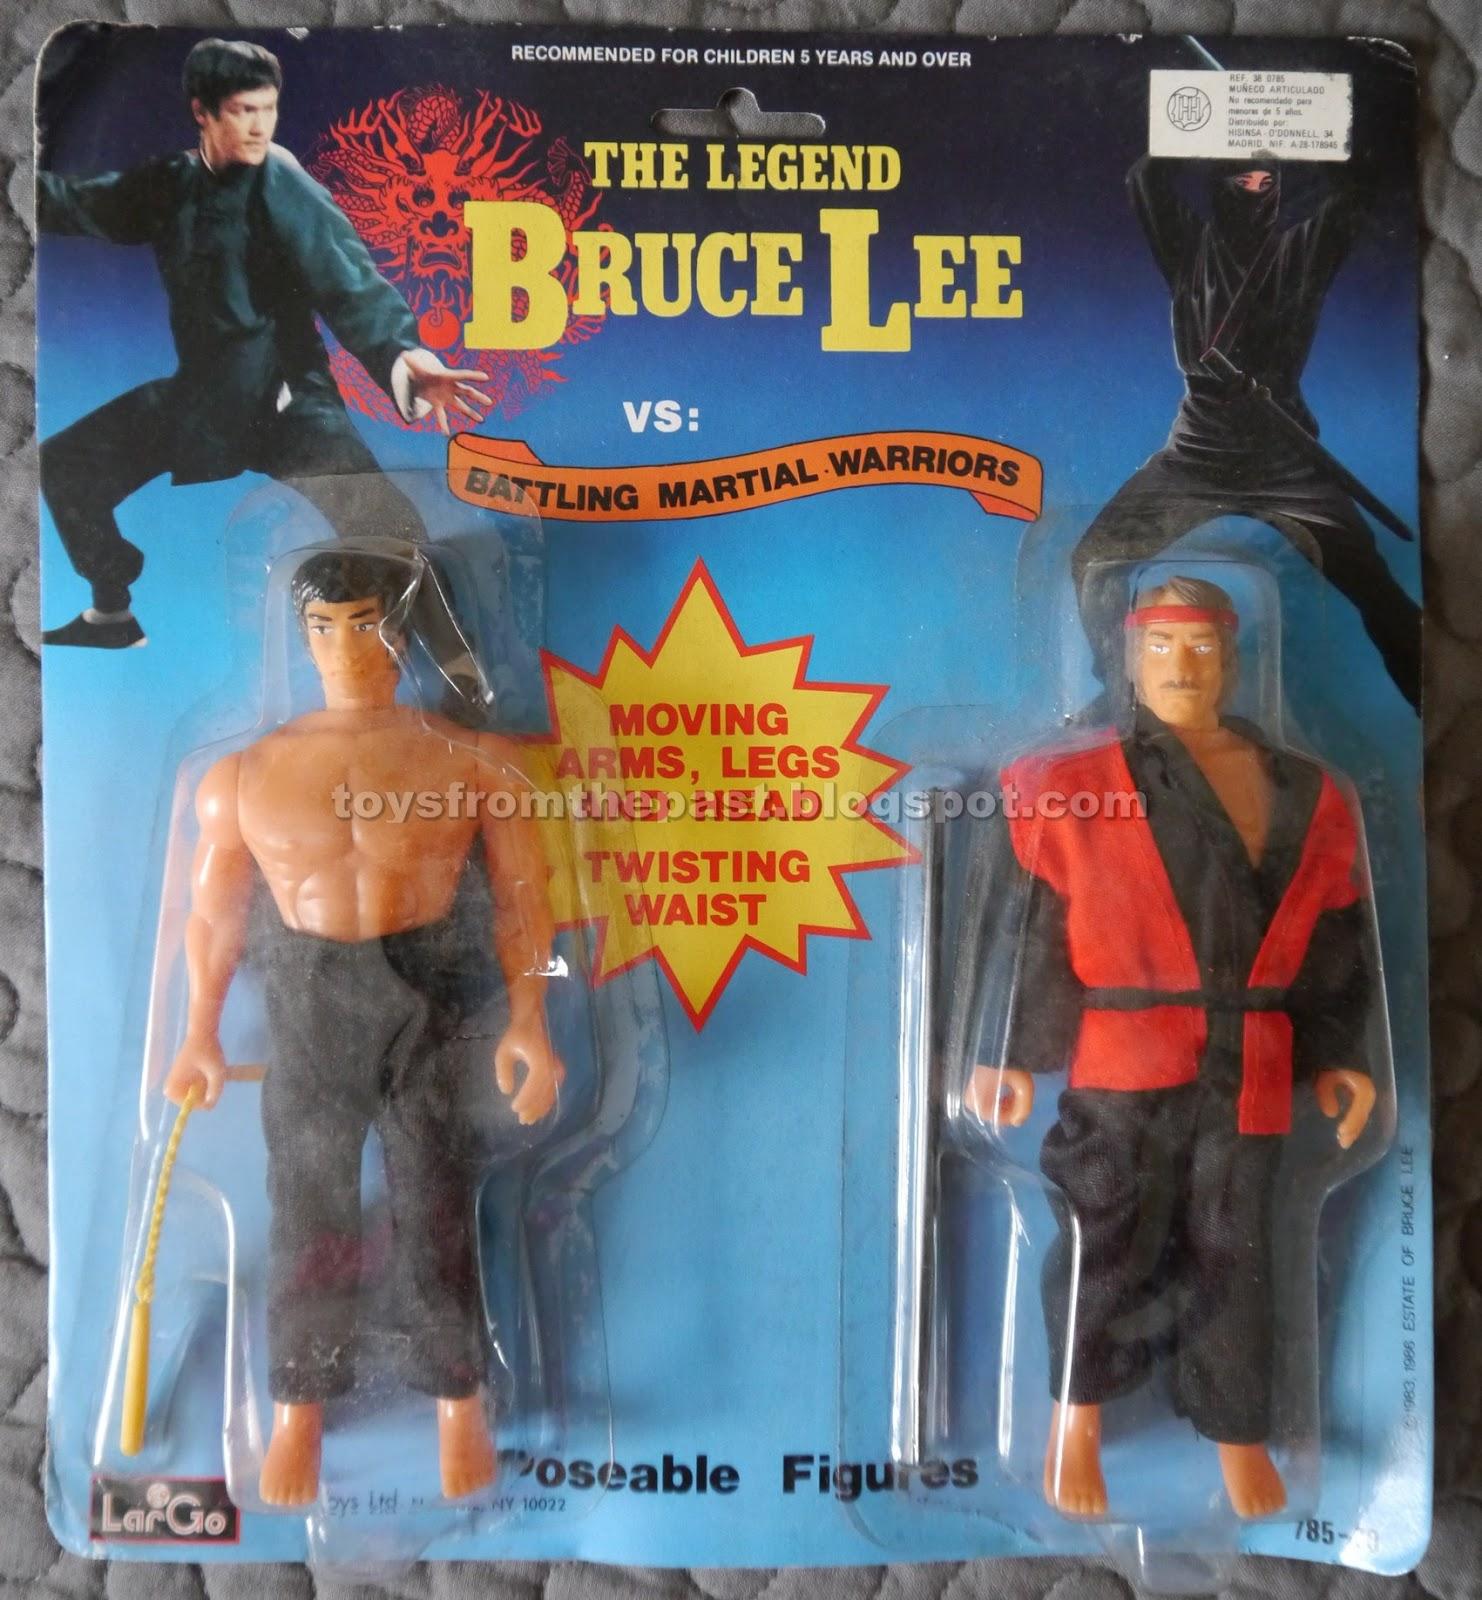 The+Legend+Bruce+Lee+and+Battling+Martia